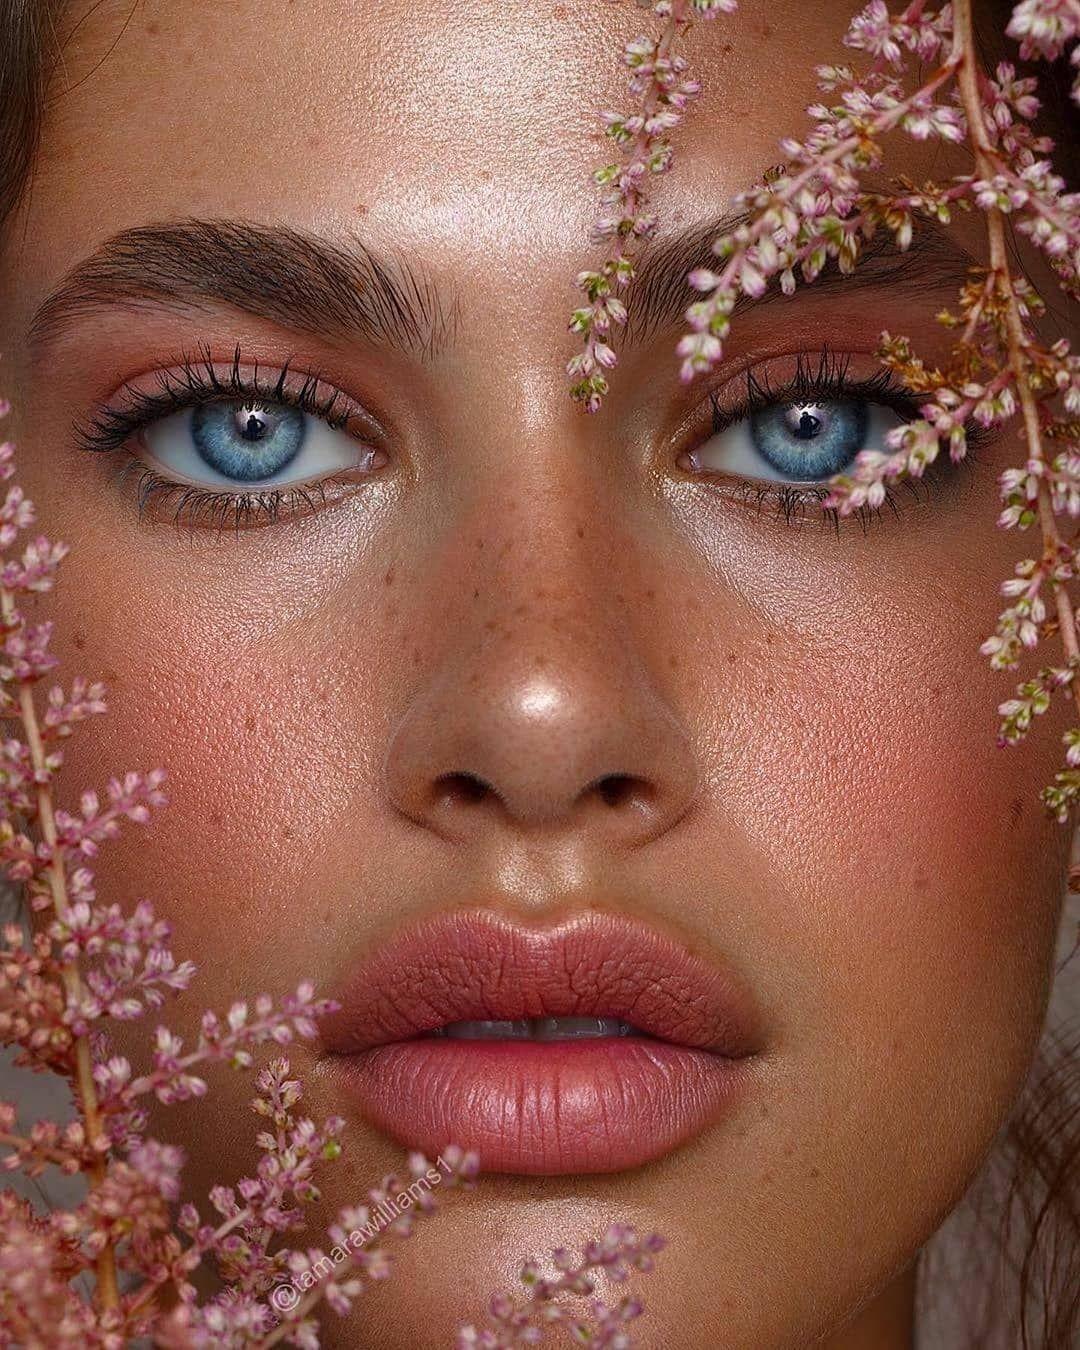 "Photo of Make-Up & Hairstyle Magazine på Instagram: ""@wilhelminamodels KELTIE 💗 @keltiestraith 🦋 Skott av @ tamarawilliams1 Makeup @jessi_makeup #makeup #makeupartist # makeuptutorial…"""